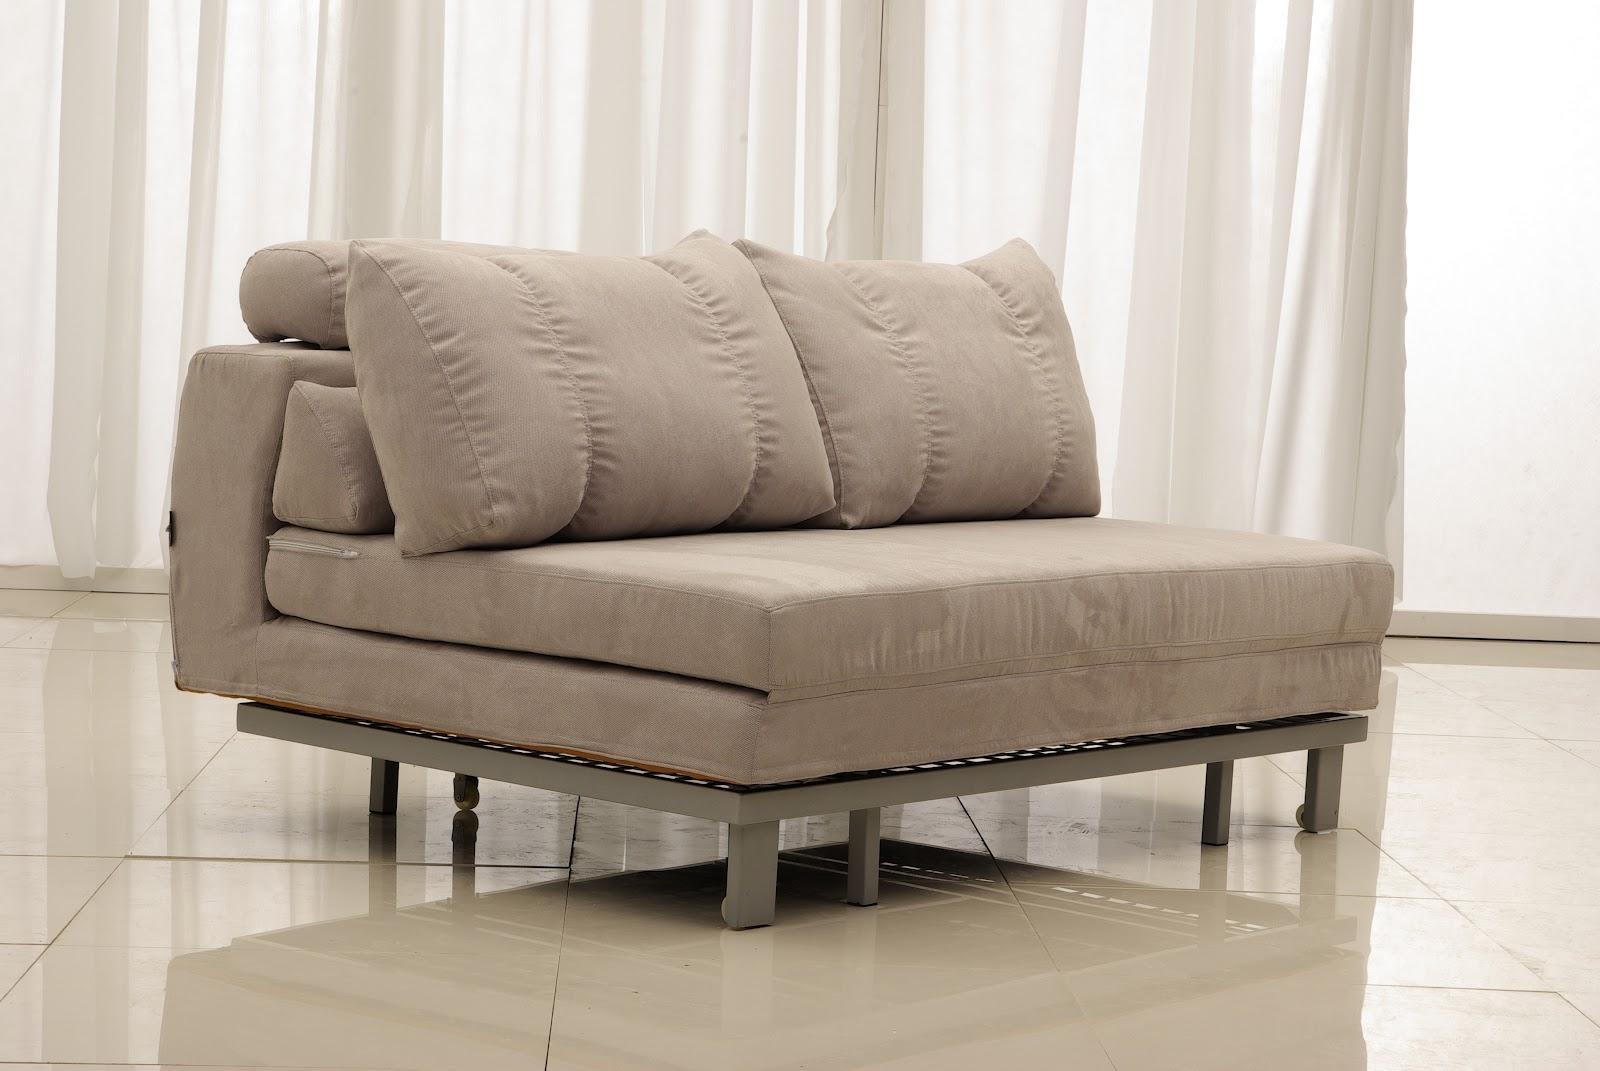 sofa sleeper san francisco 3 ft wide bed 20 photos sofas diego ideas